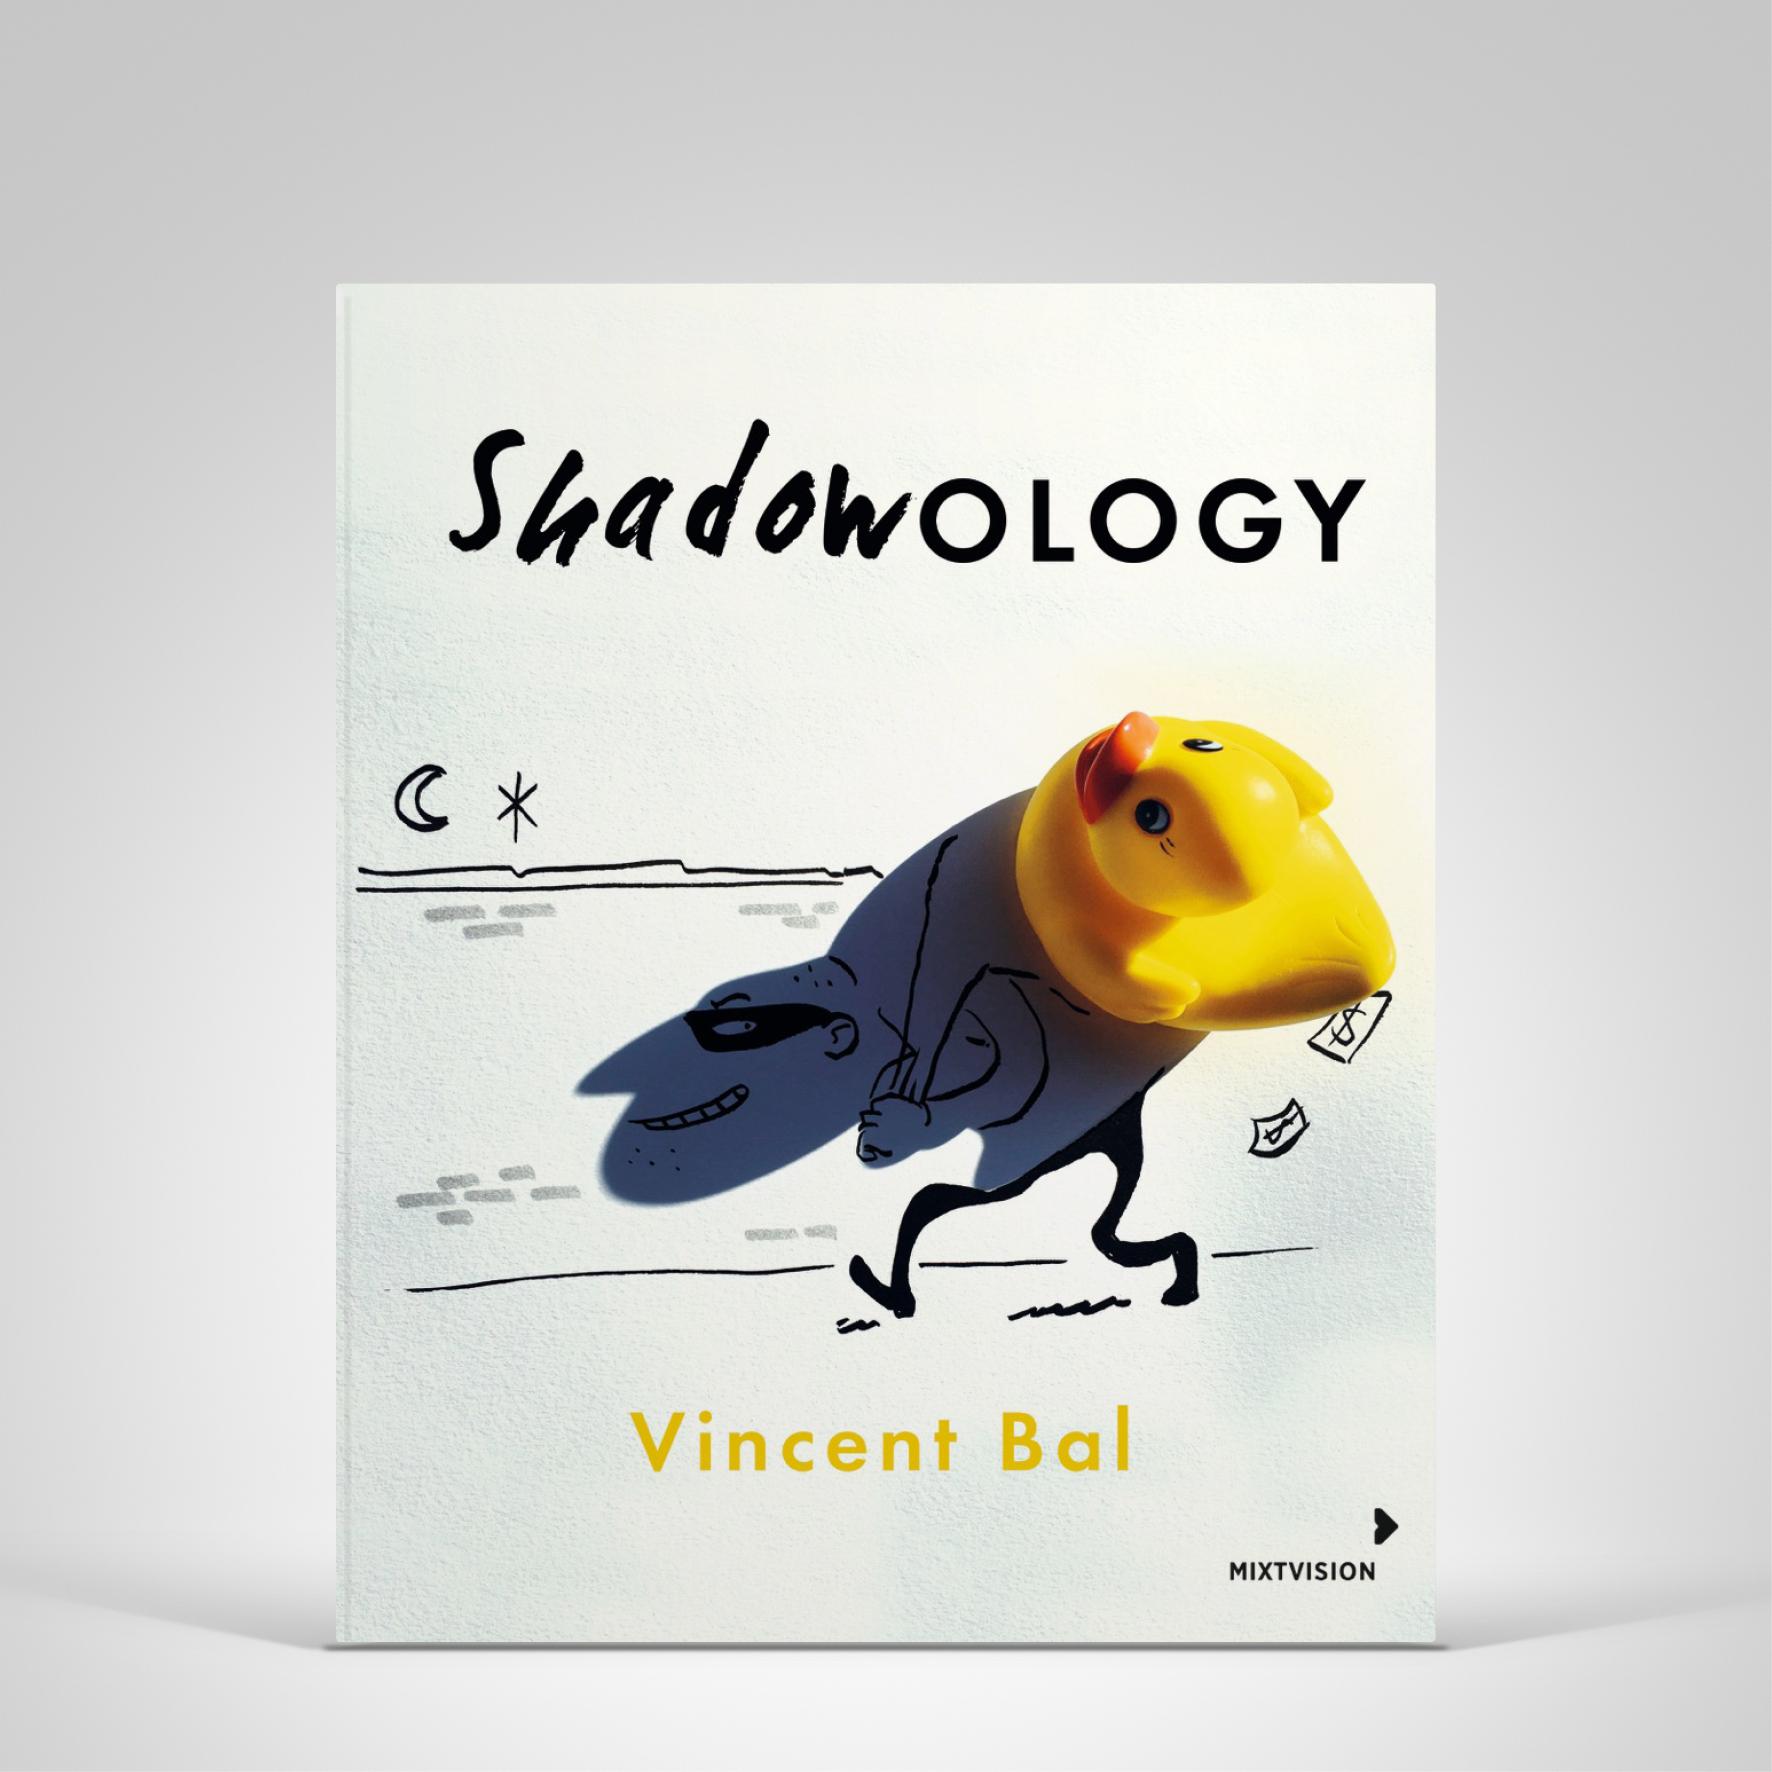 Shadowology, Titelbild